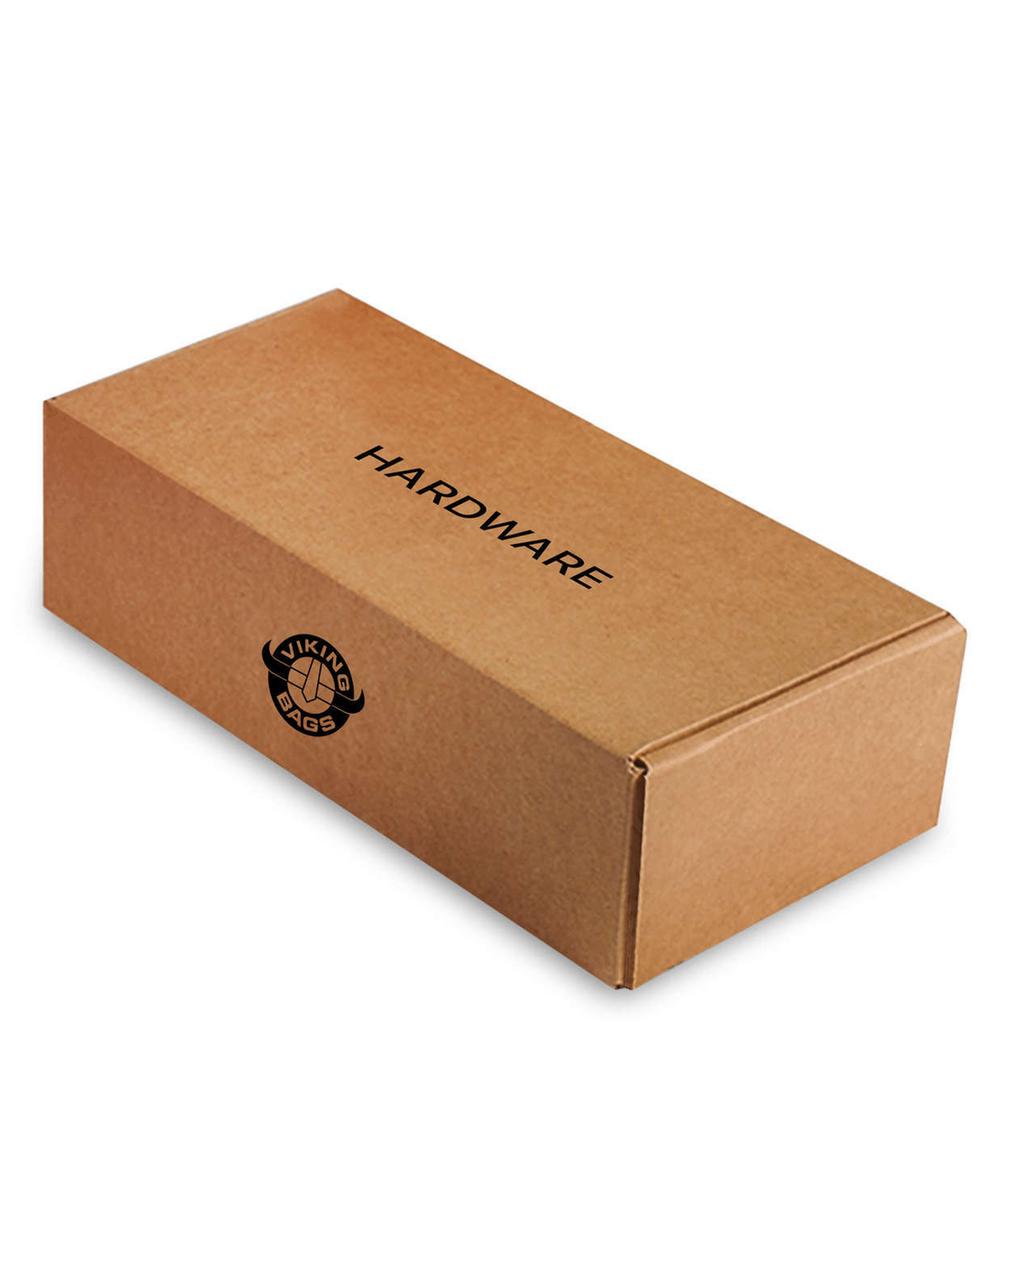 Honda 1500 Valkyrie Standard Slanted L Motorcycle saddlebags Box